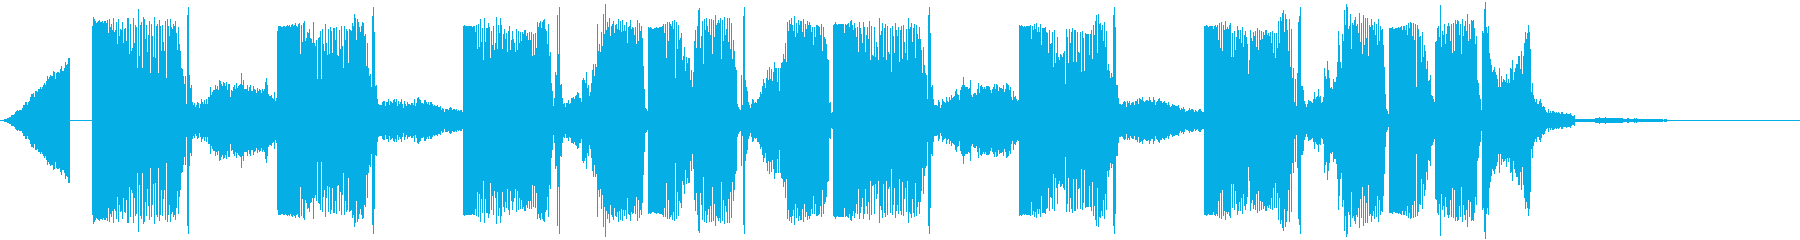 Kawaii系のポップなジングルの再生済みの波形